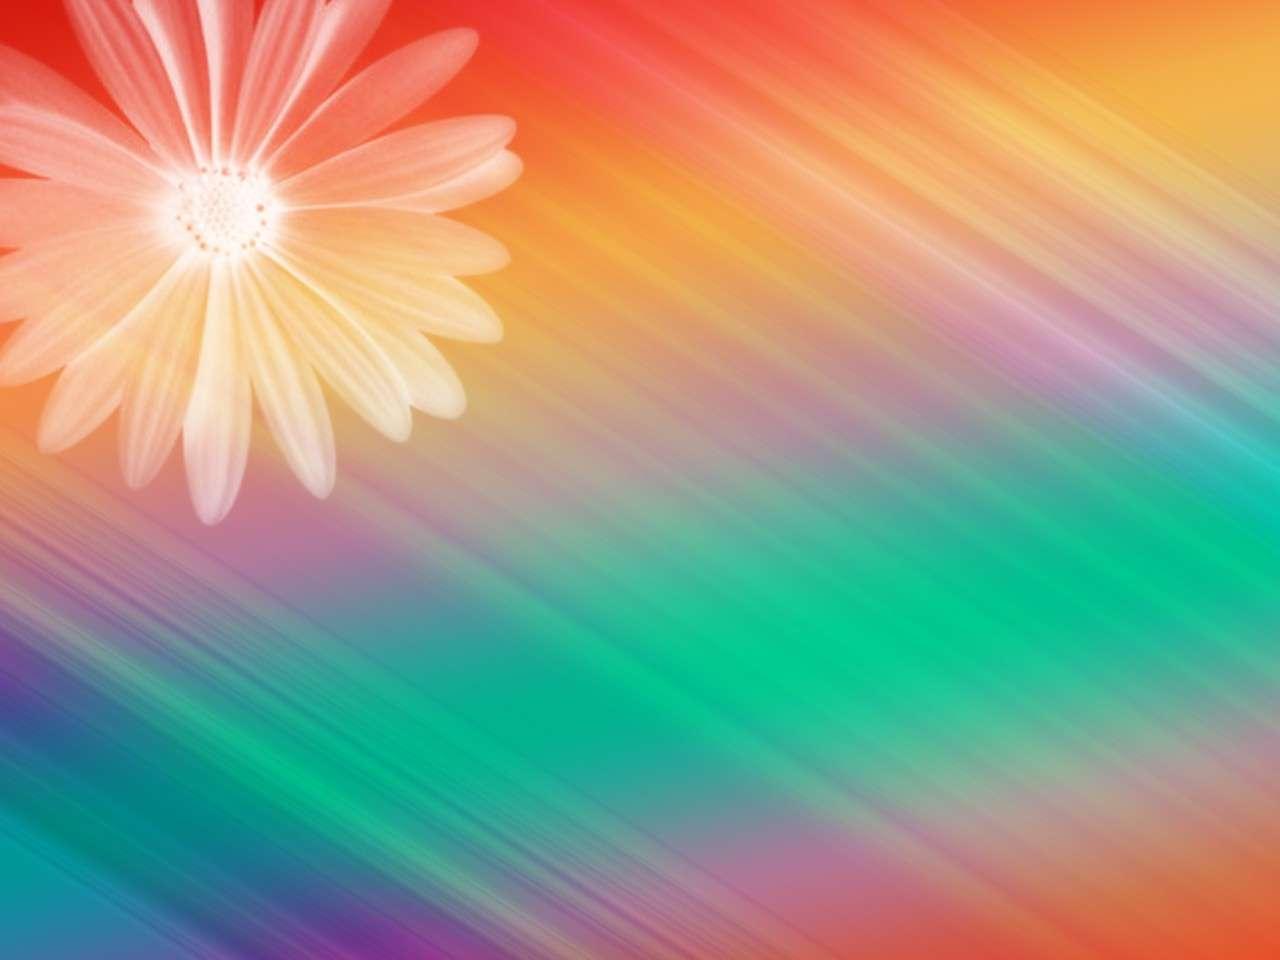 Colorful Pretty Designs Backgrounds Elegant floral design rainbow 1280x960